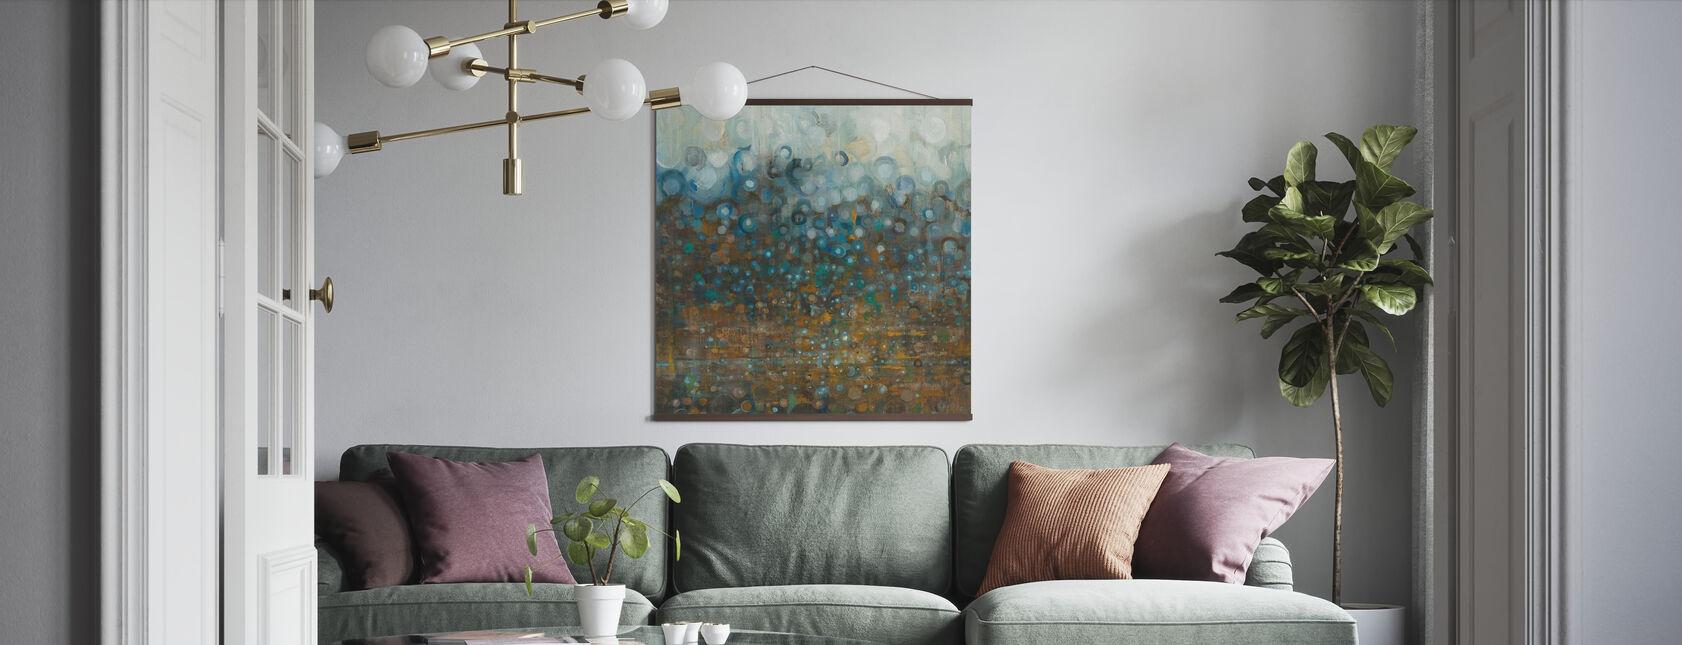 Blå og Bronse prikker - Plakat - Stue